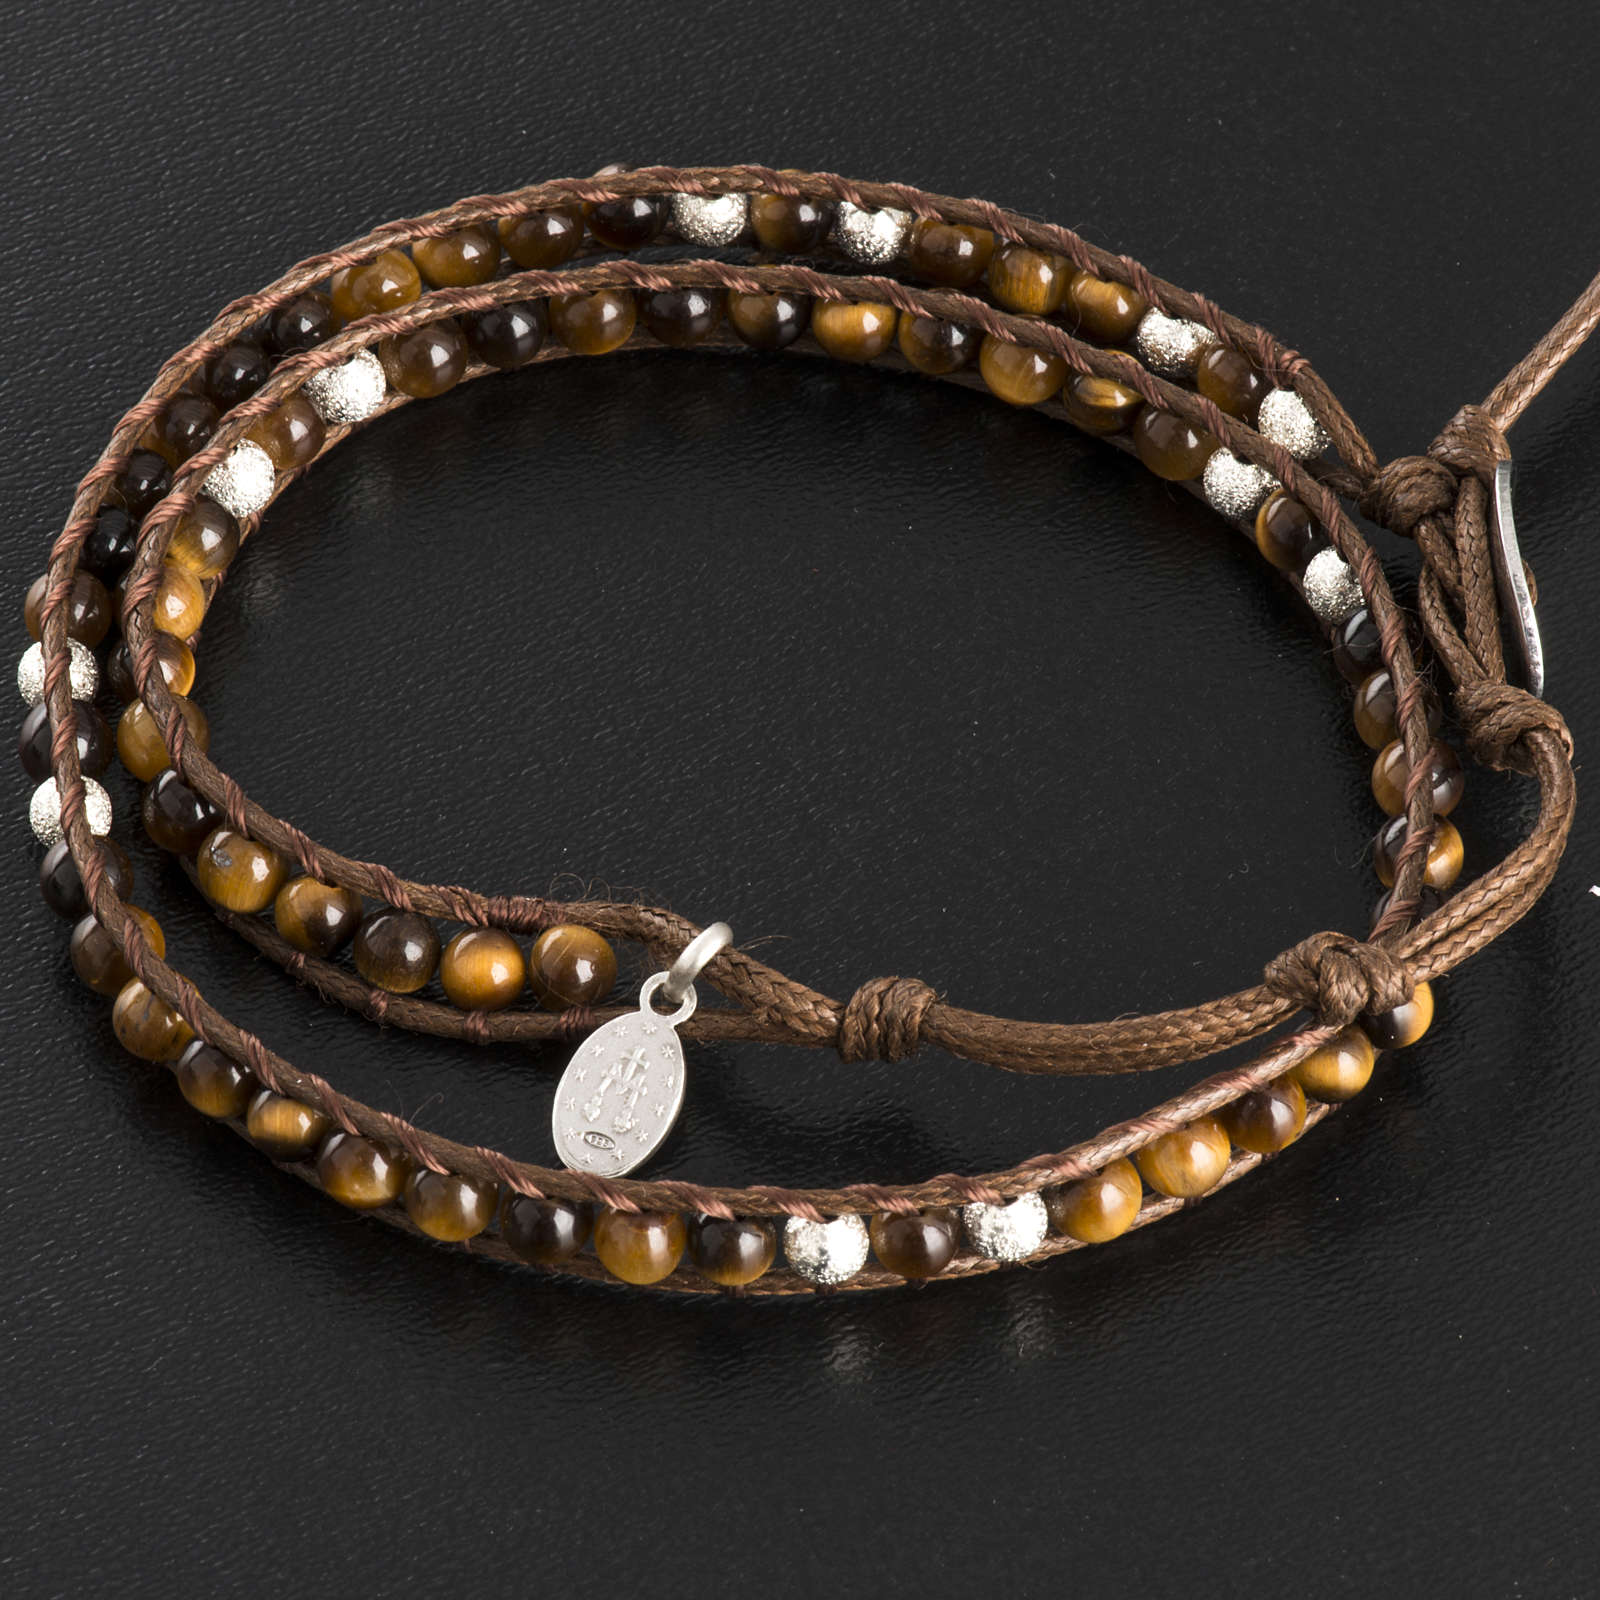 Tiger's eye bracelet 4mm 4